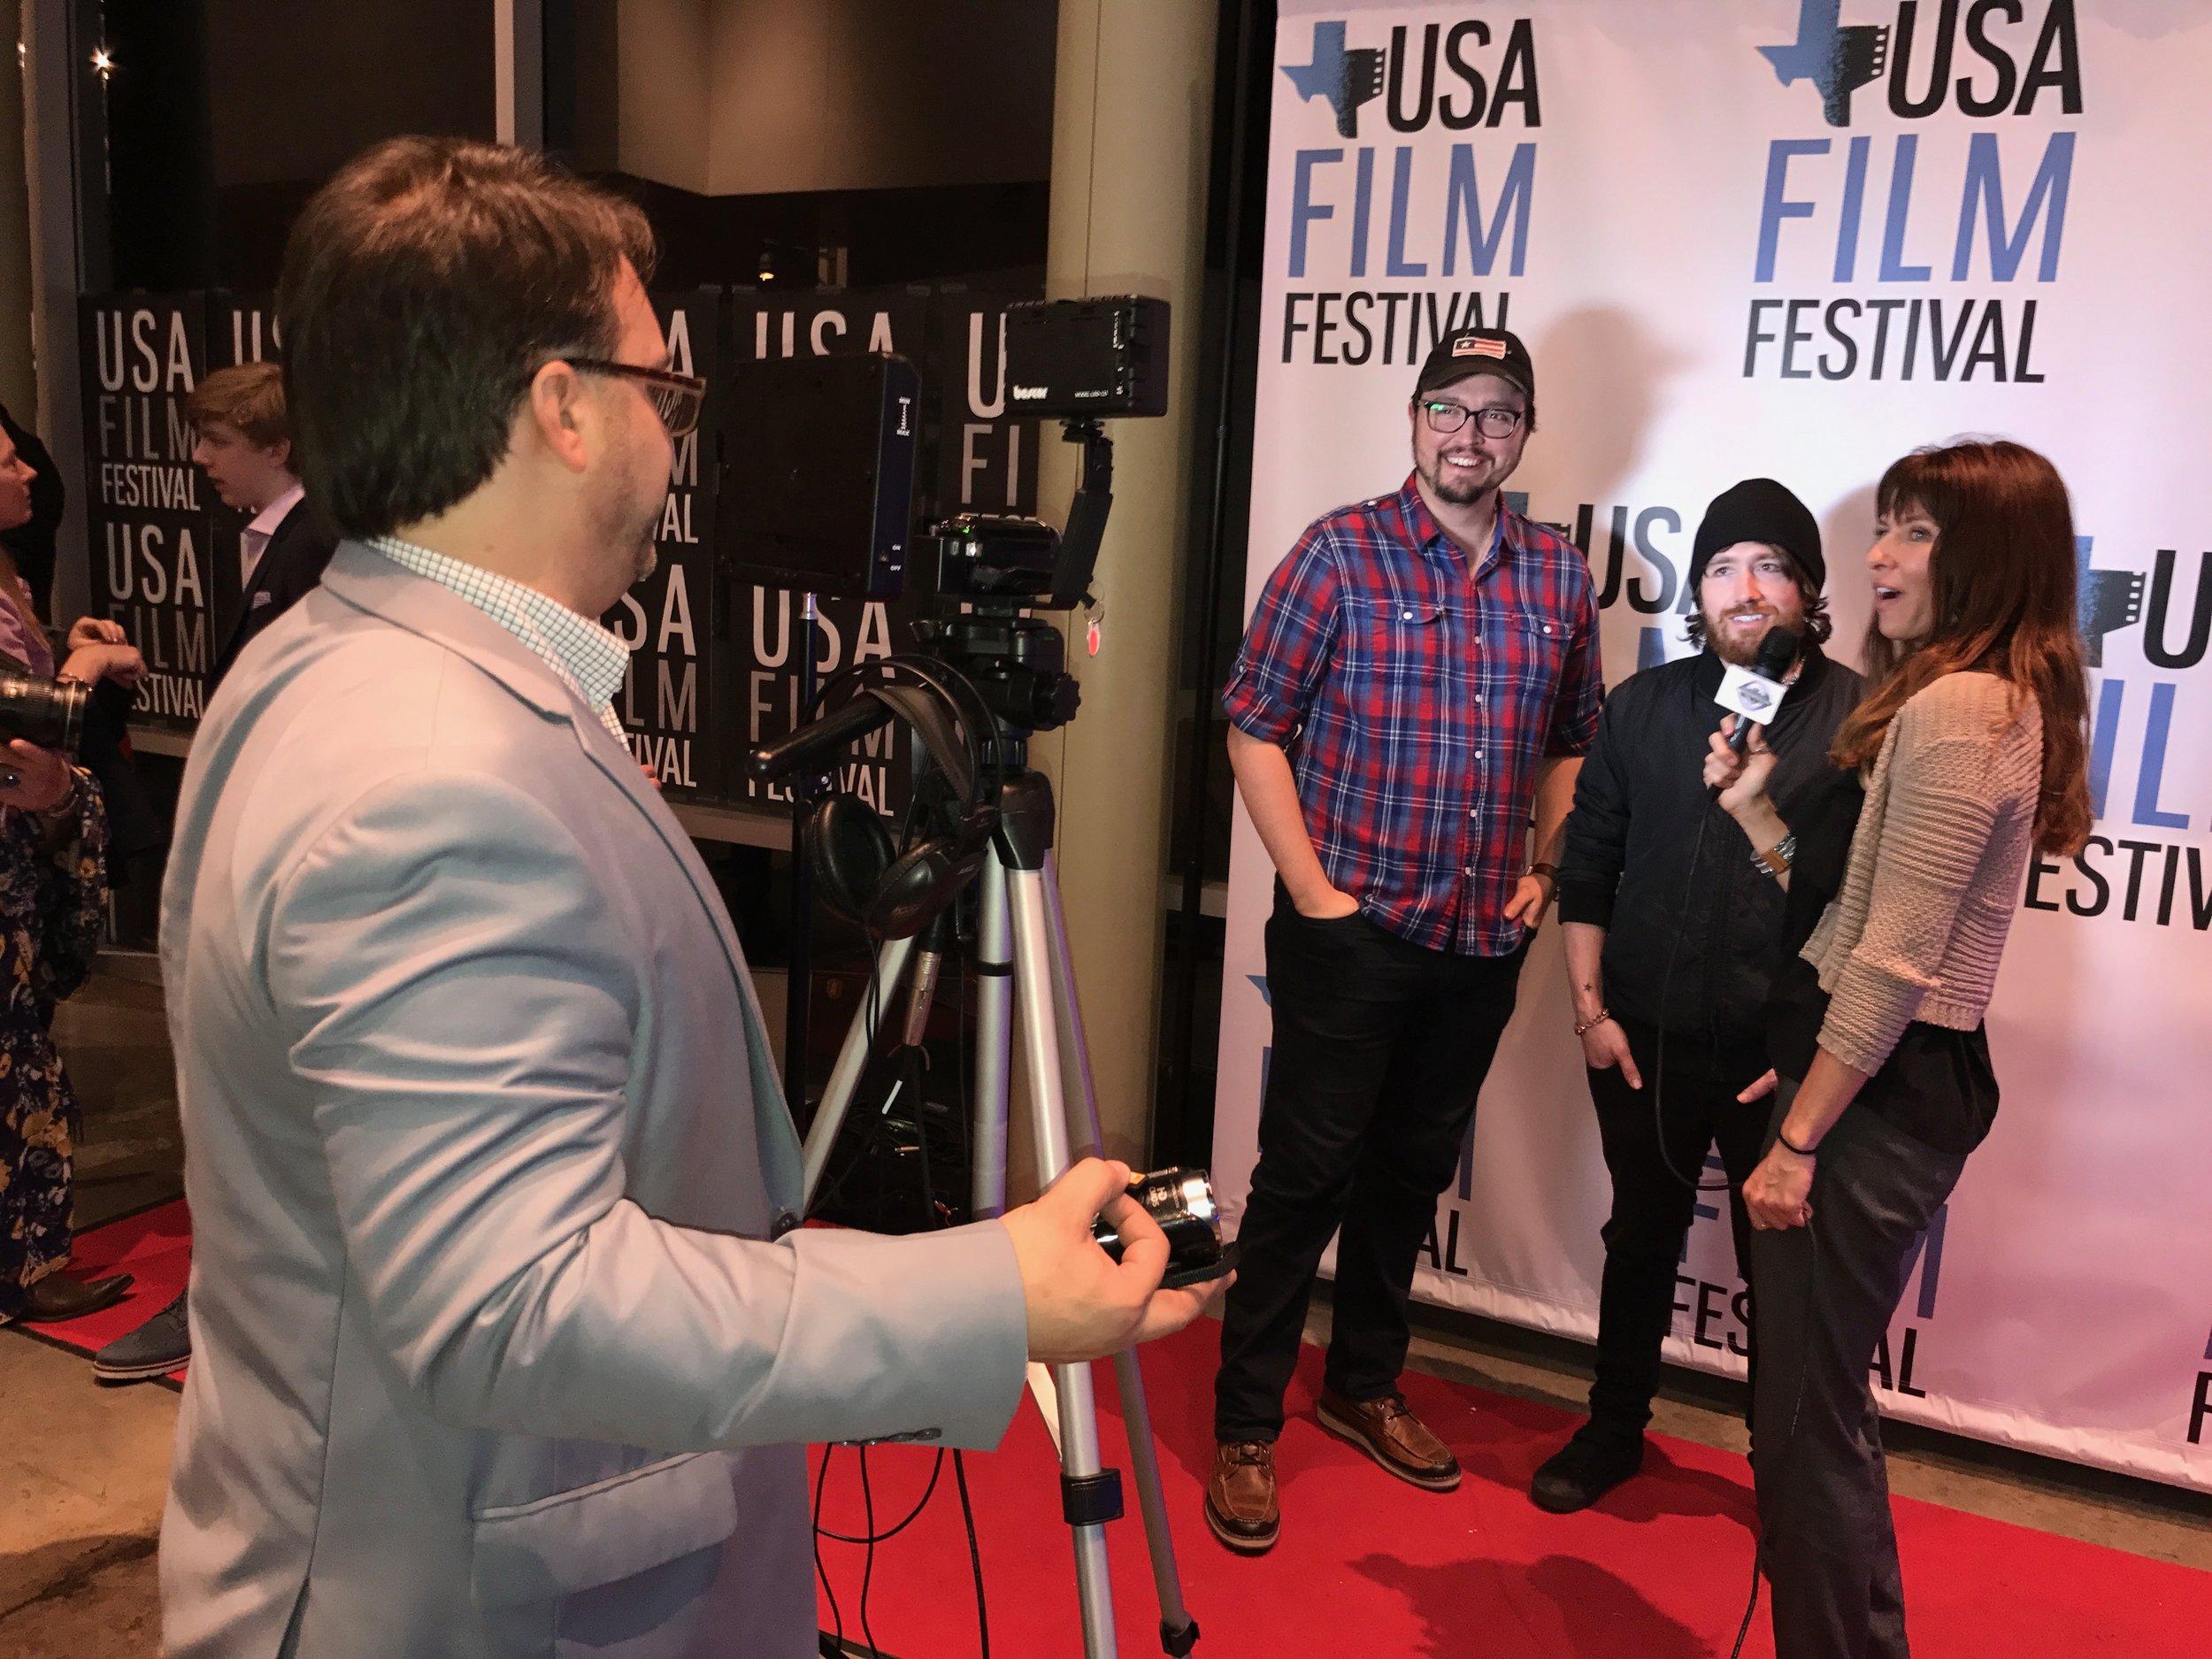 Christiano Dias and David Jay at the USA Film Festival premiere in Dallas, TX.